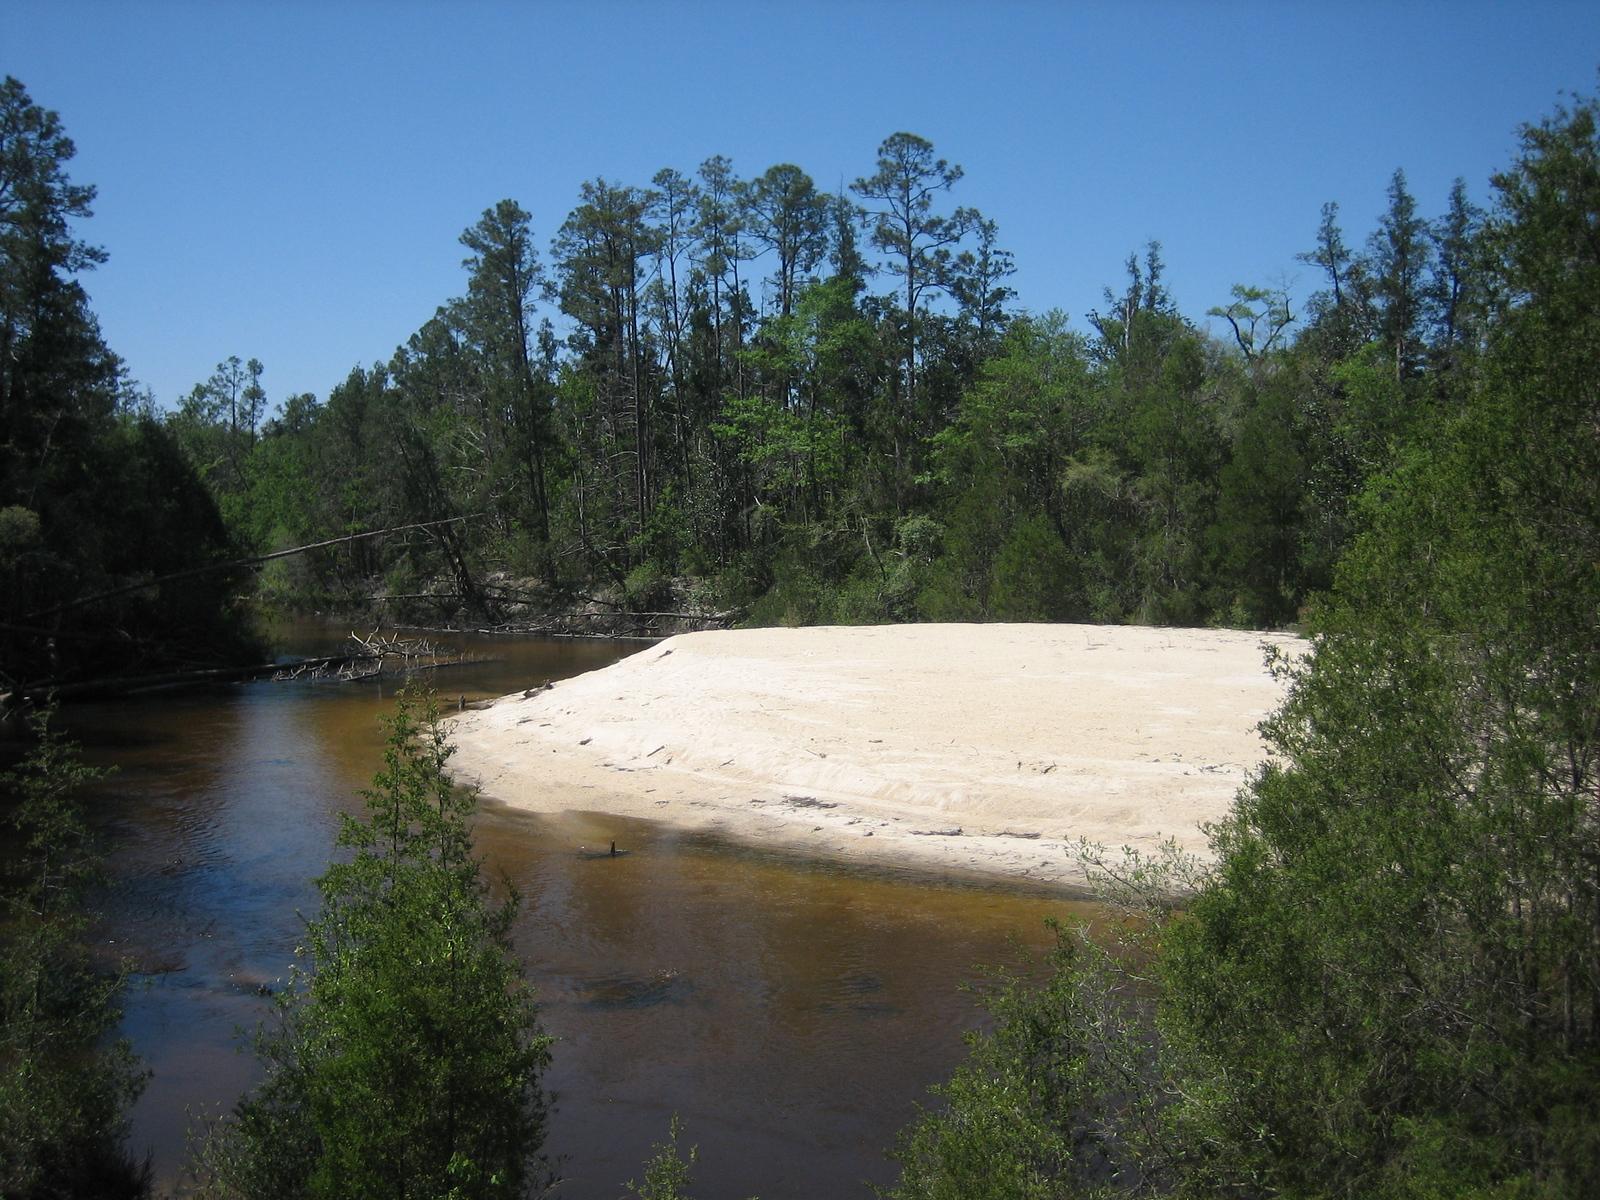 The Blackwater River from the Juniper Creek Trail<br /> PHOTO CREDIT: Sandra Friend / Florida Trail Association